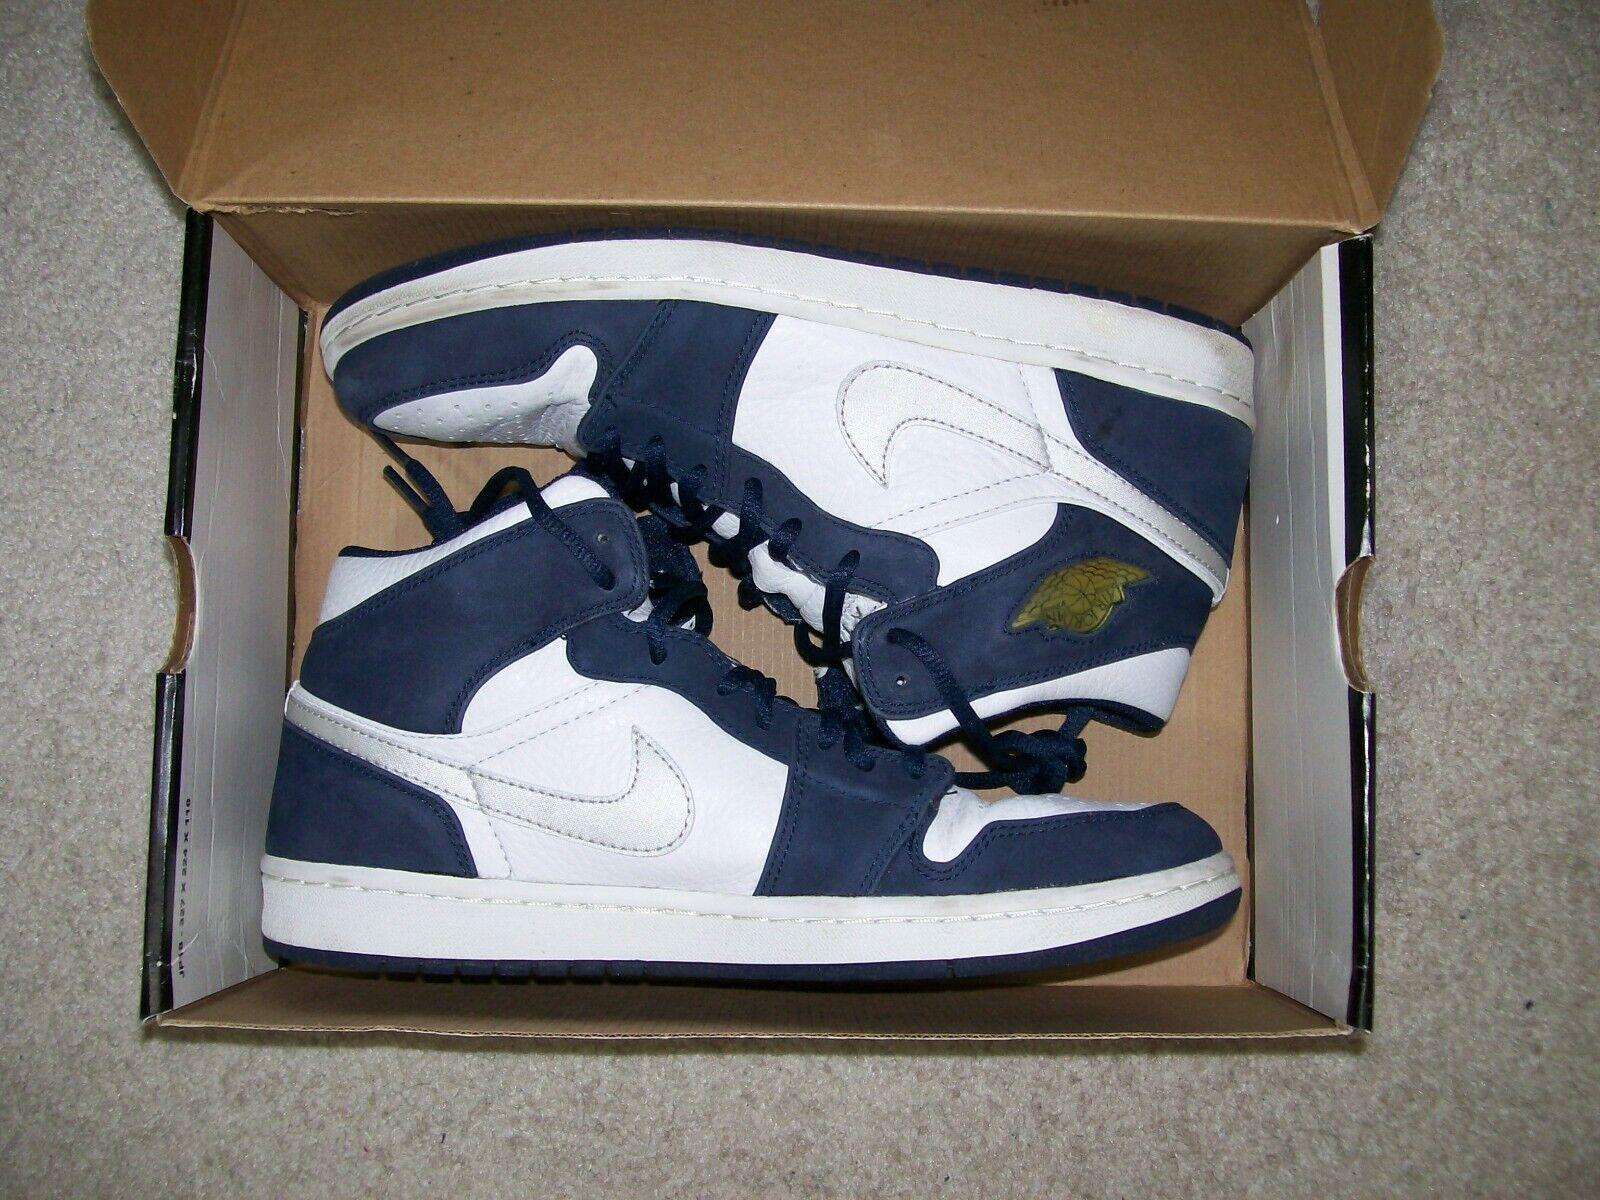 2001 Numerada 10.5 Nike Jordan 1 Retro + medianoche Air Azul Marino 136065-101 criados Royal